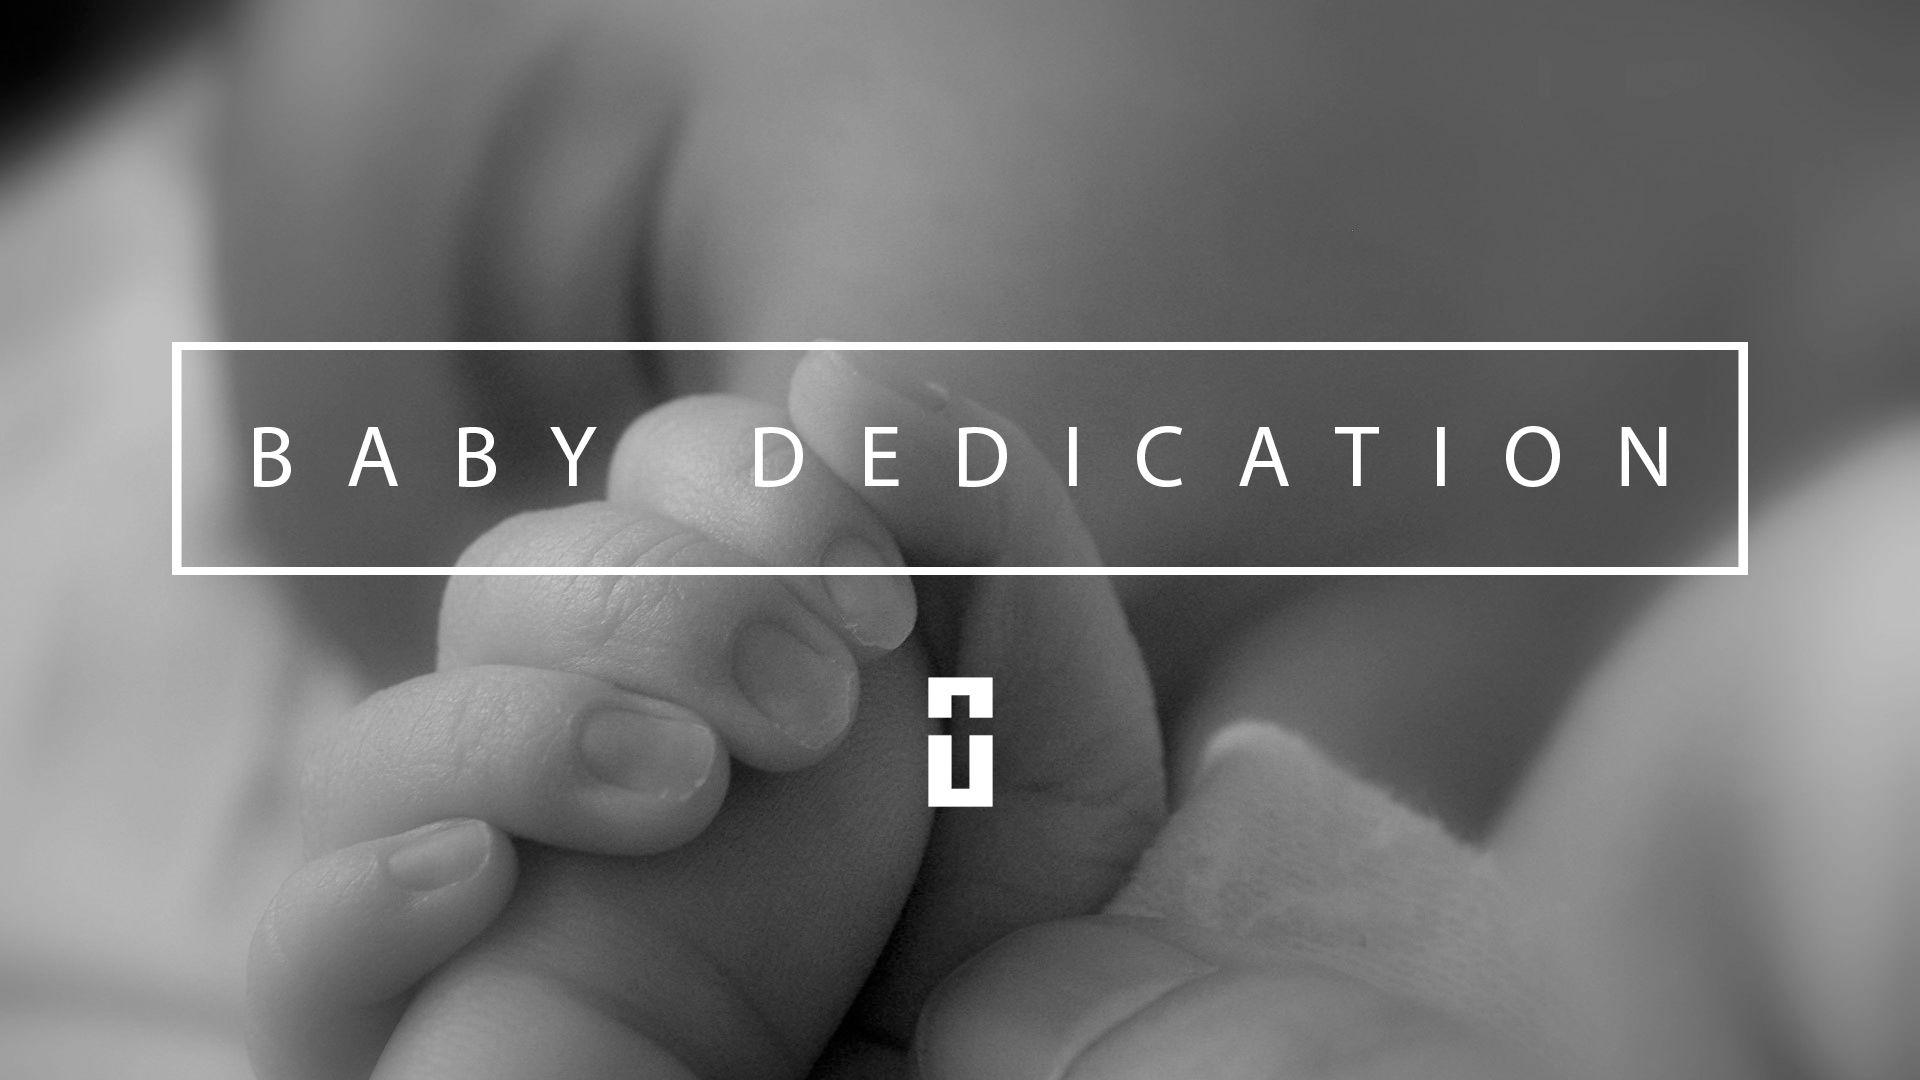 Baby Dedication Slide For Worship Service My Design Prayer